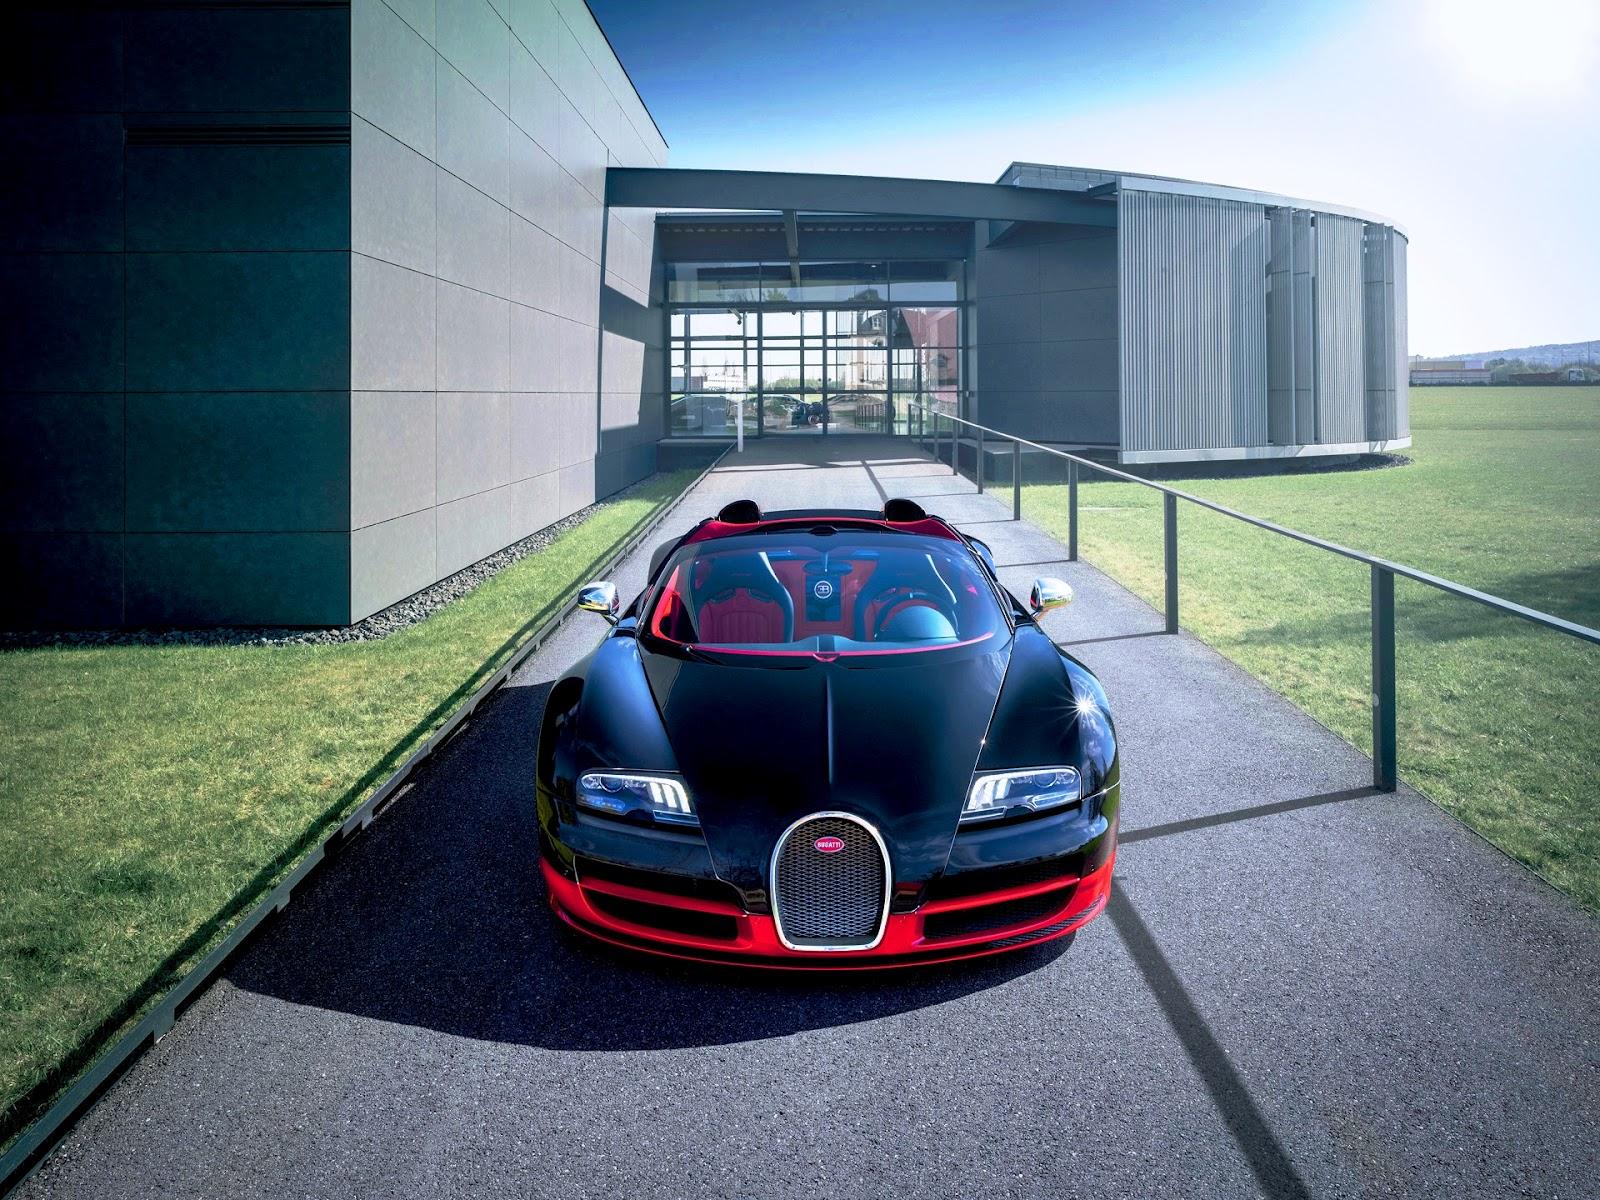 2012-Bugatti-Veyron-Grand-Sport-Vitesse-Black-and-Red-Front-1920x1440 Remarkable Bugatti Veyron Grand Sport Vitesse Black and Blue Cars Trend